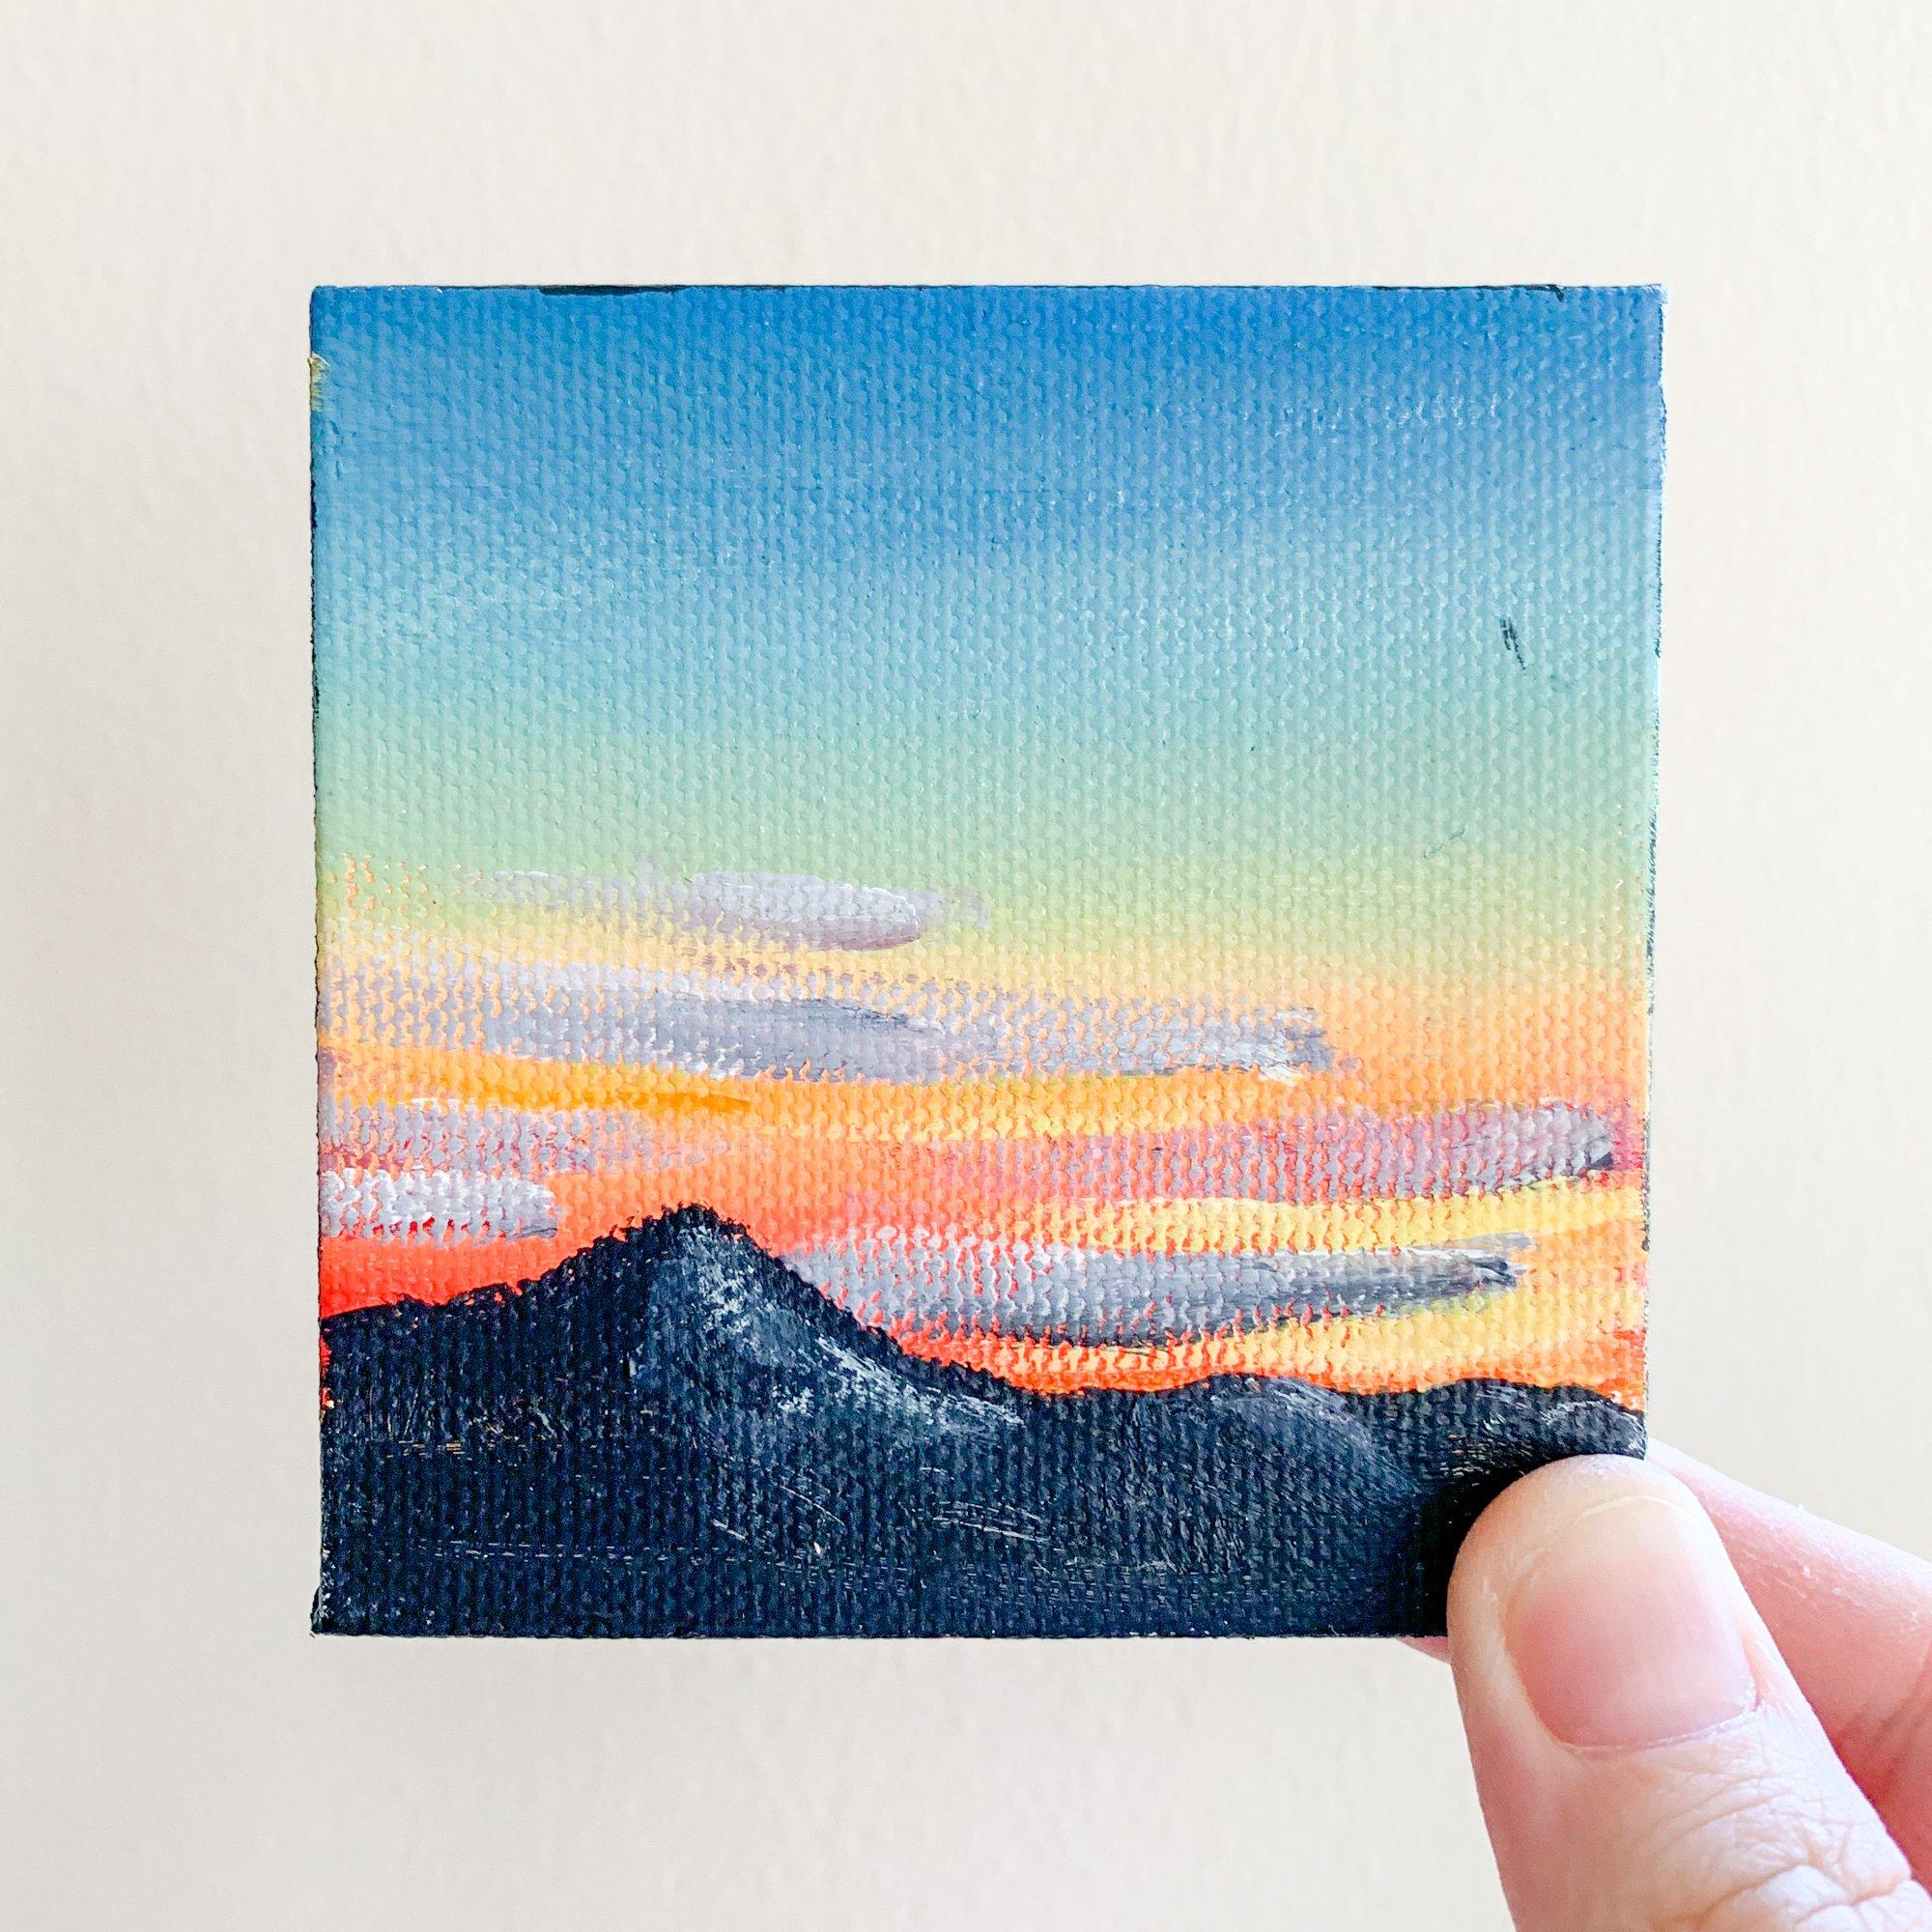 Mountain Sunset Landscape Original Acrylic Painting 3x3 Tiny Art In 2020 Small Canvas Art Canvas Art Painting Mini Canvas Art